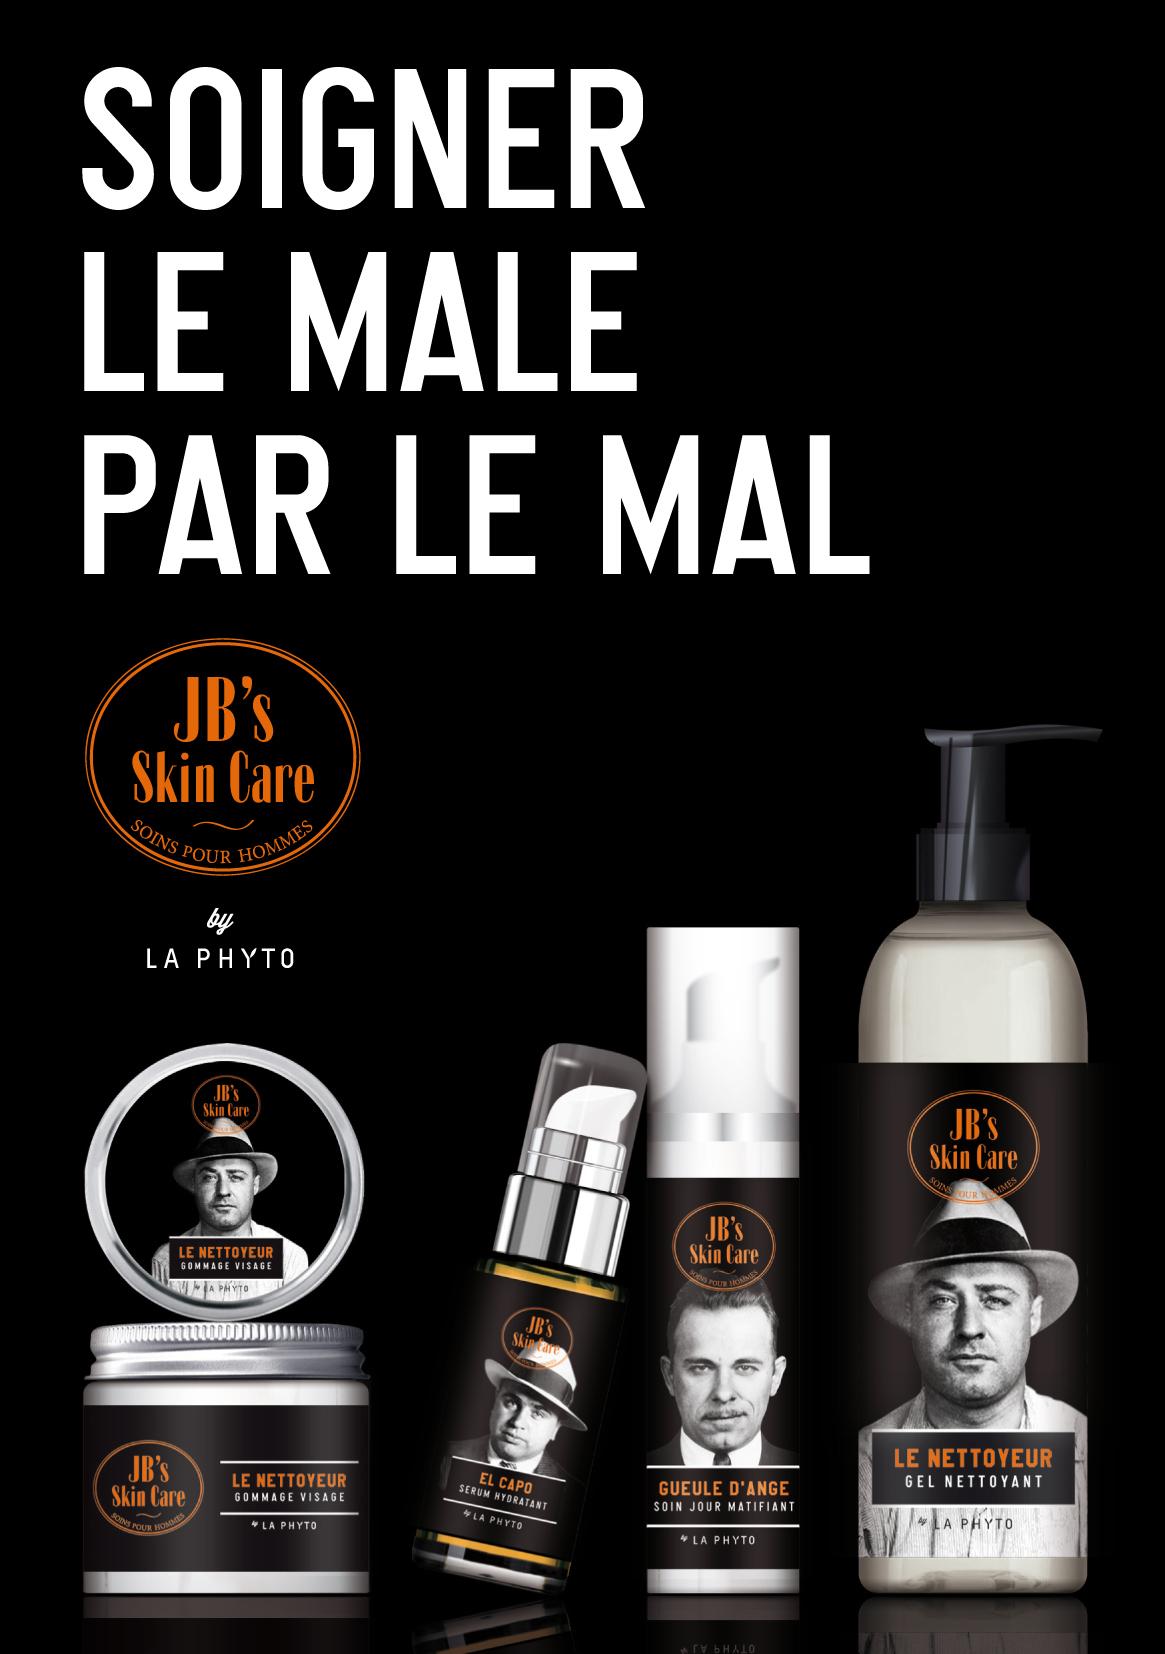 JBs-Skin-Care